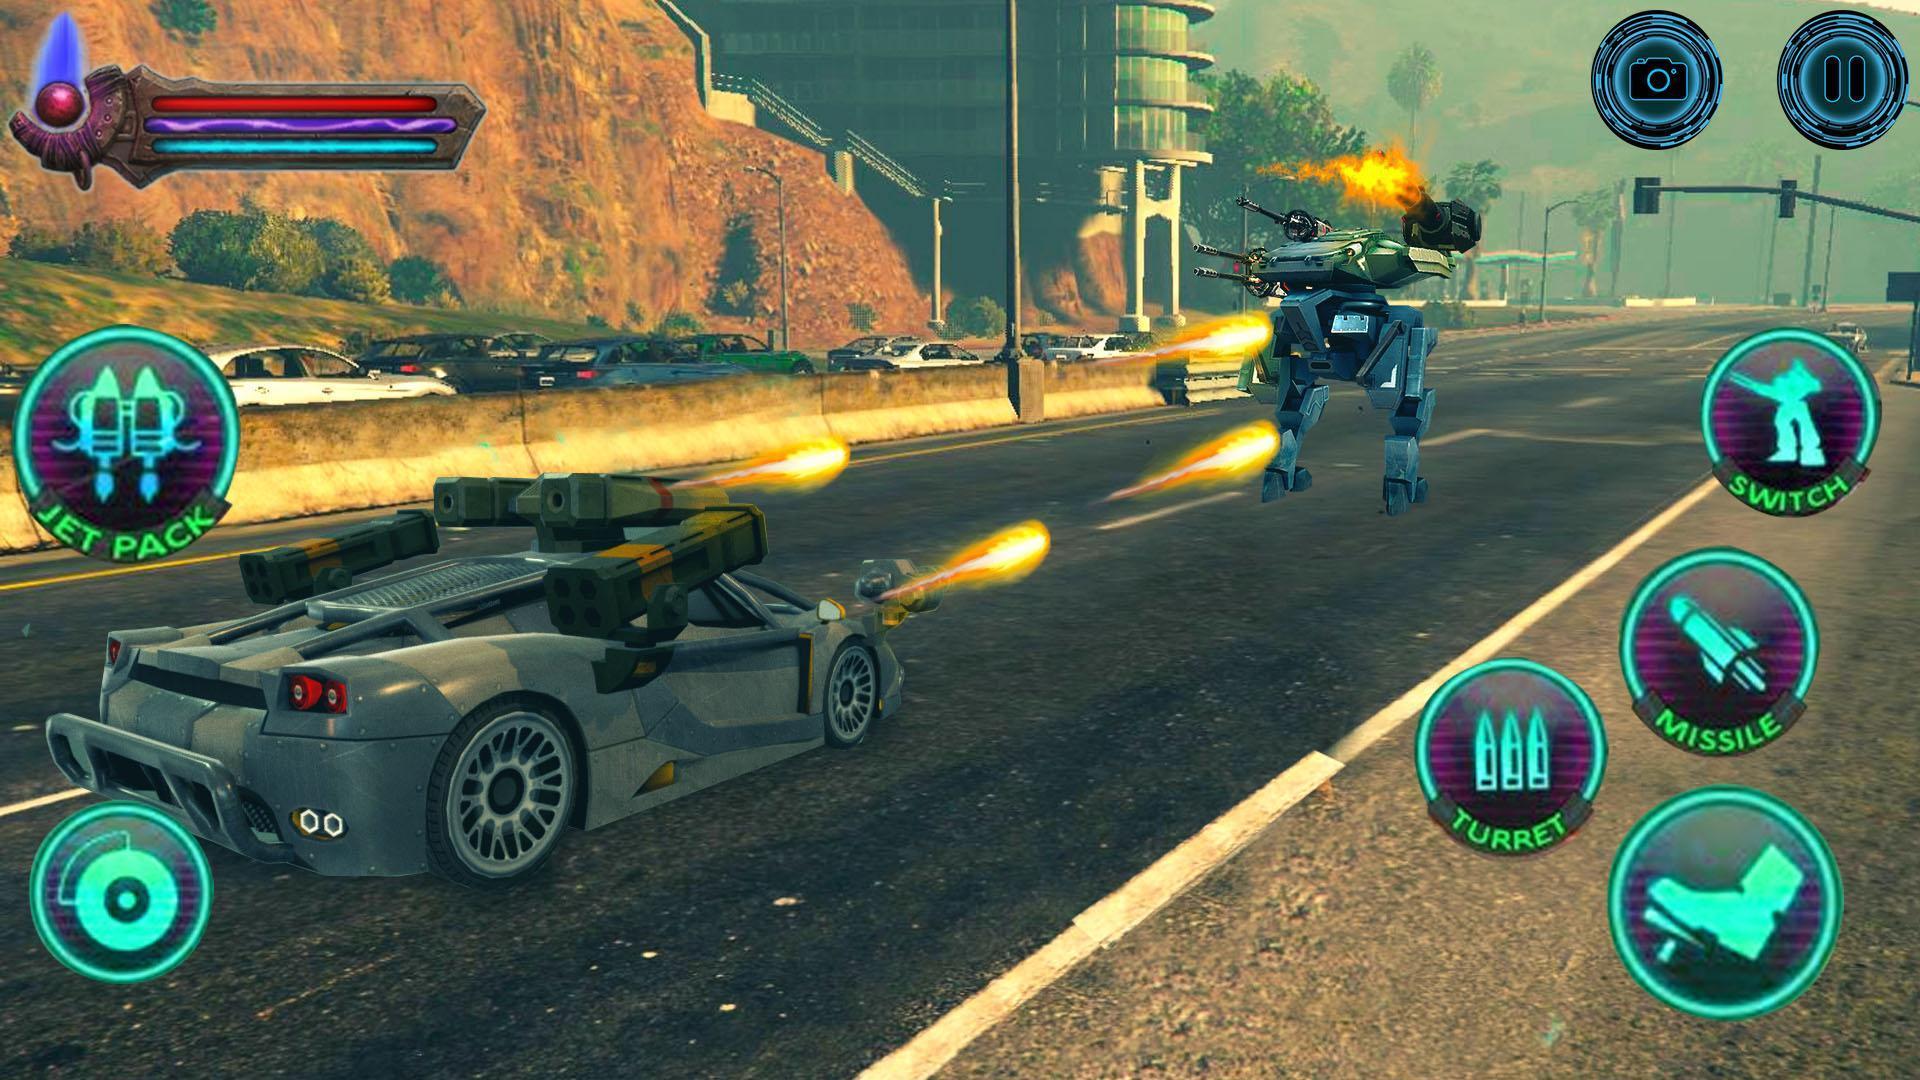 Autobots robot car war 1. 2. 4 download apk for android aptoide.